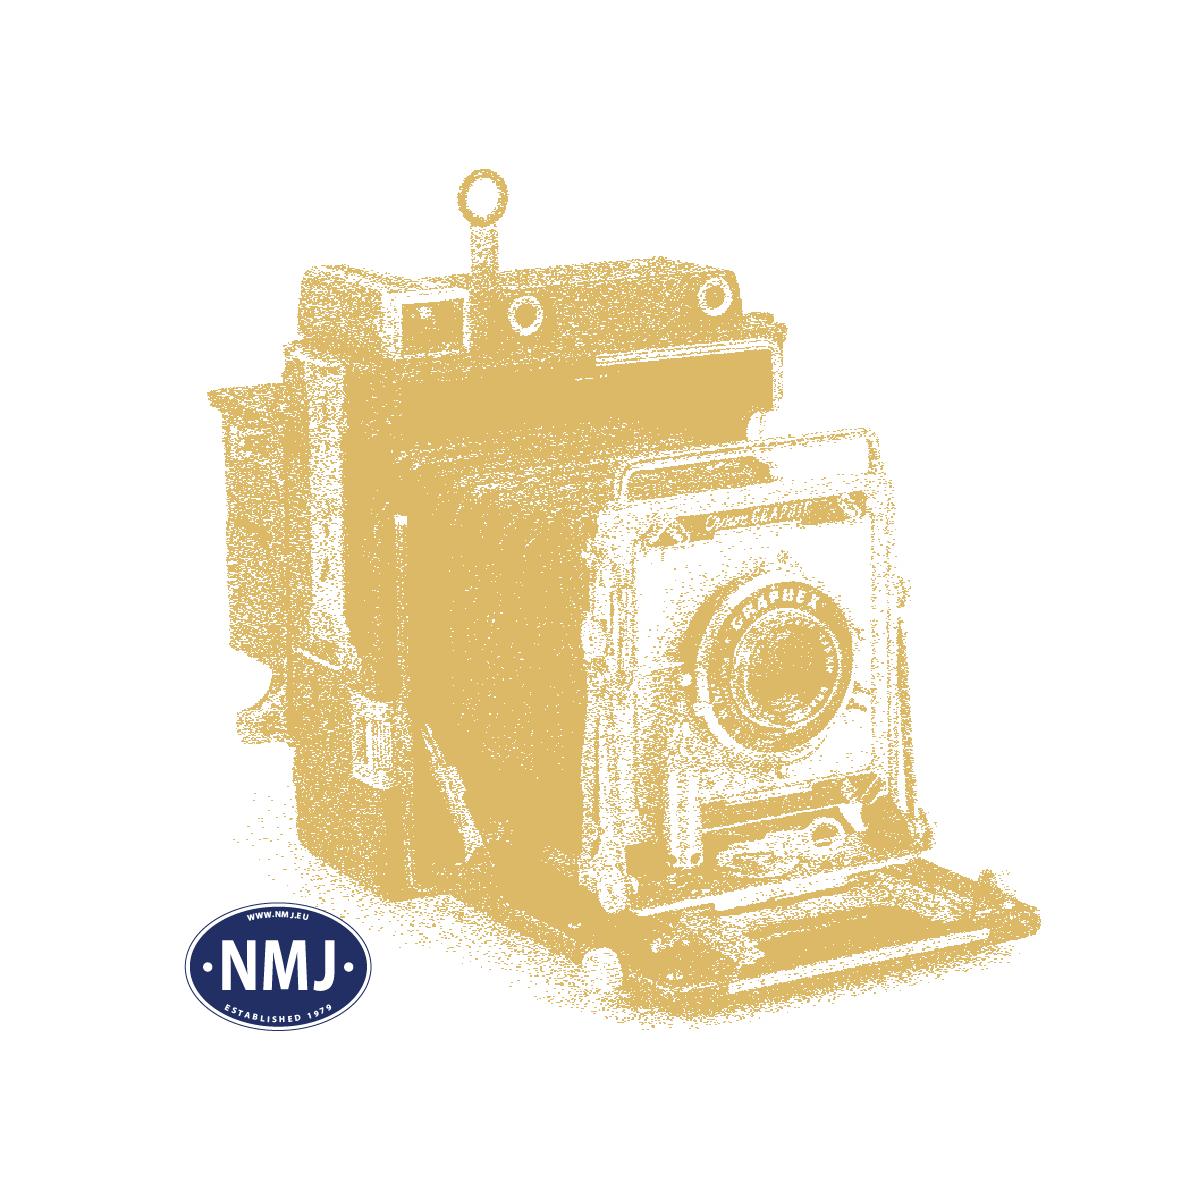 Superline Vogner, NMJ-Superline-Lt4-7121-handmade-brass-Modell-NMJSLt4-7121-HO, NMJSLt47121